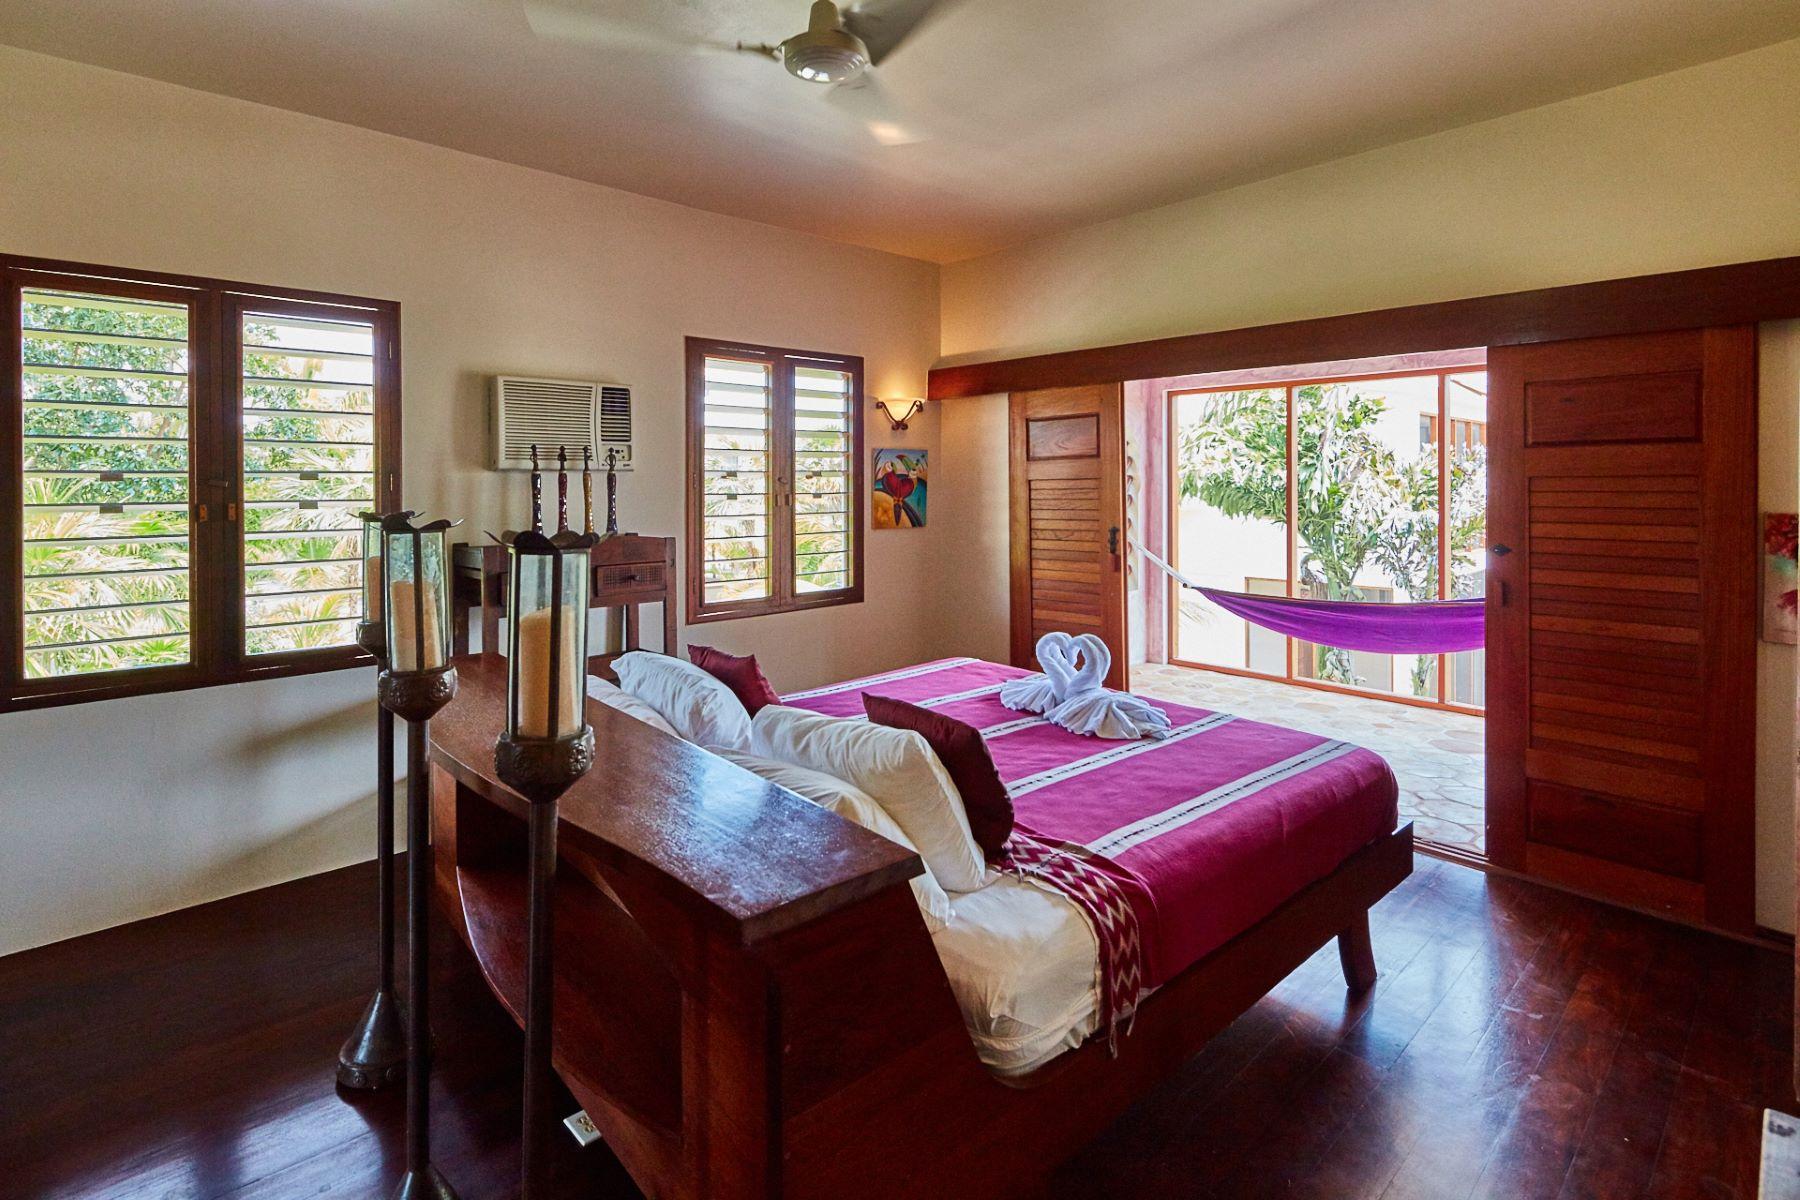 Additional photo for property listing at Villa Amethyst La Perla Del Caribe Villa Amethyst 5.5 Miles North San Pedro San Pedro Town, Belize 0 Belize